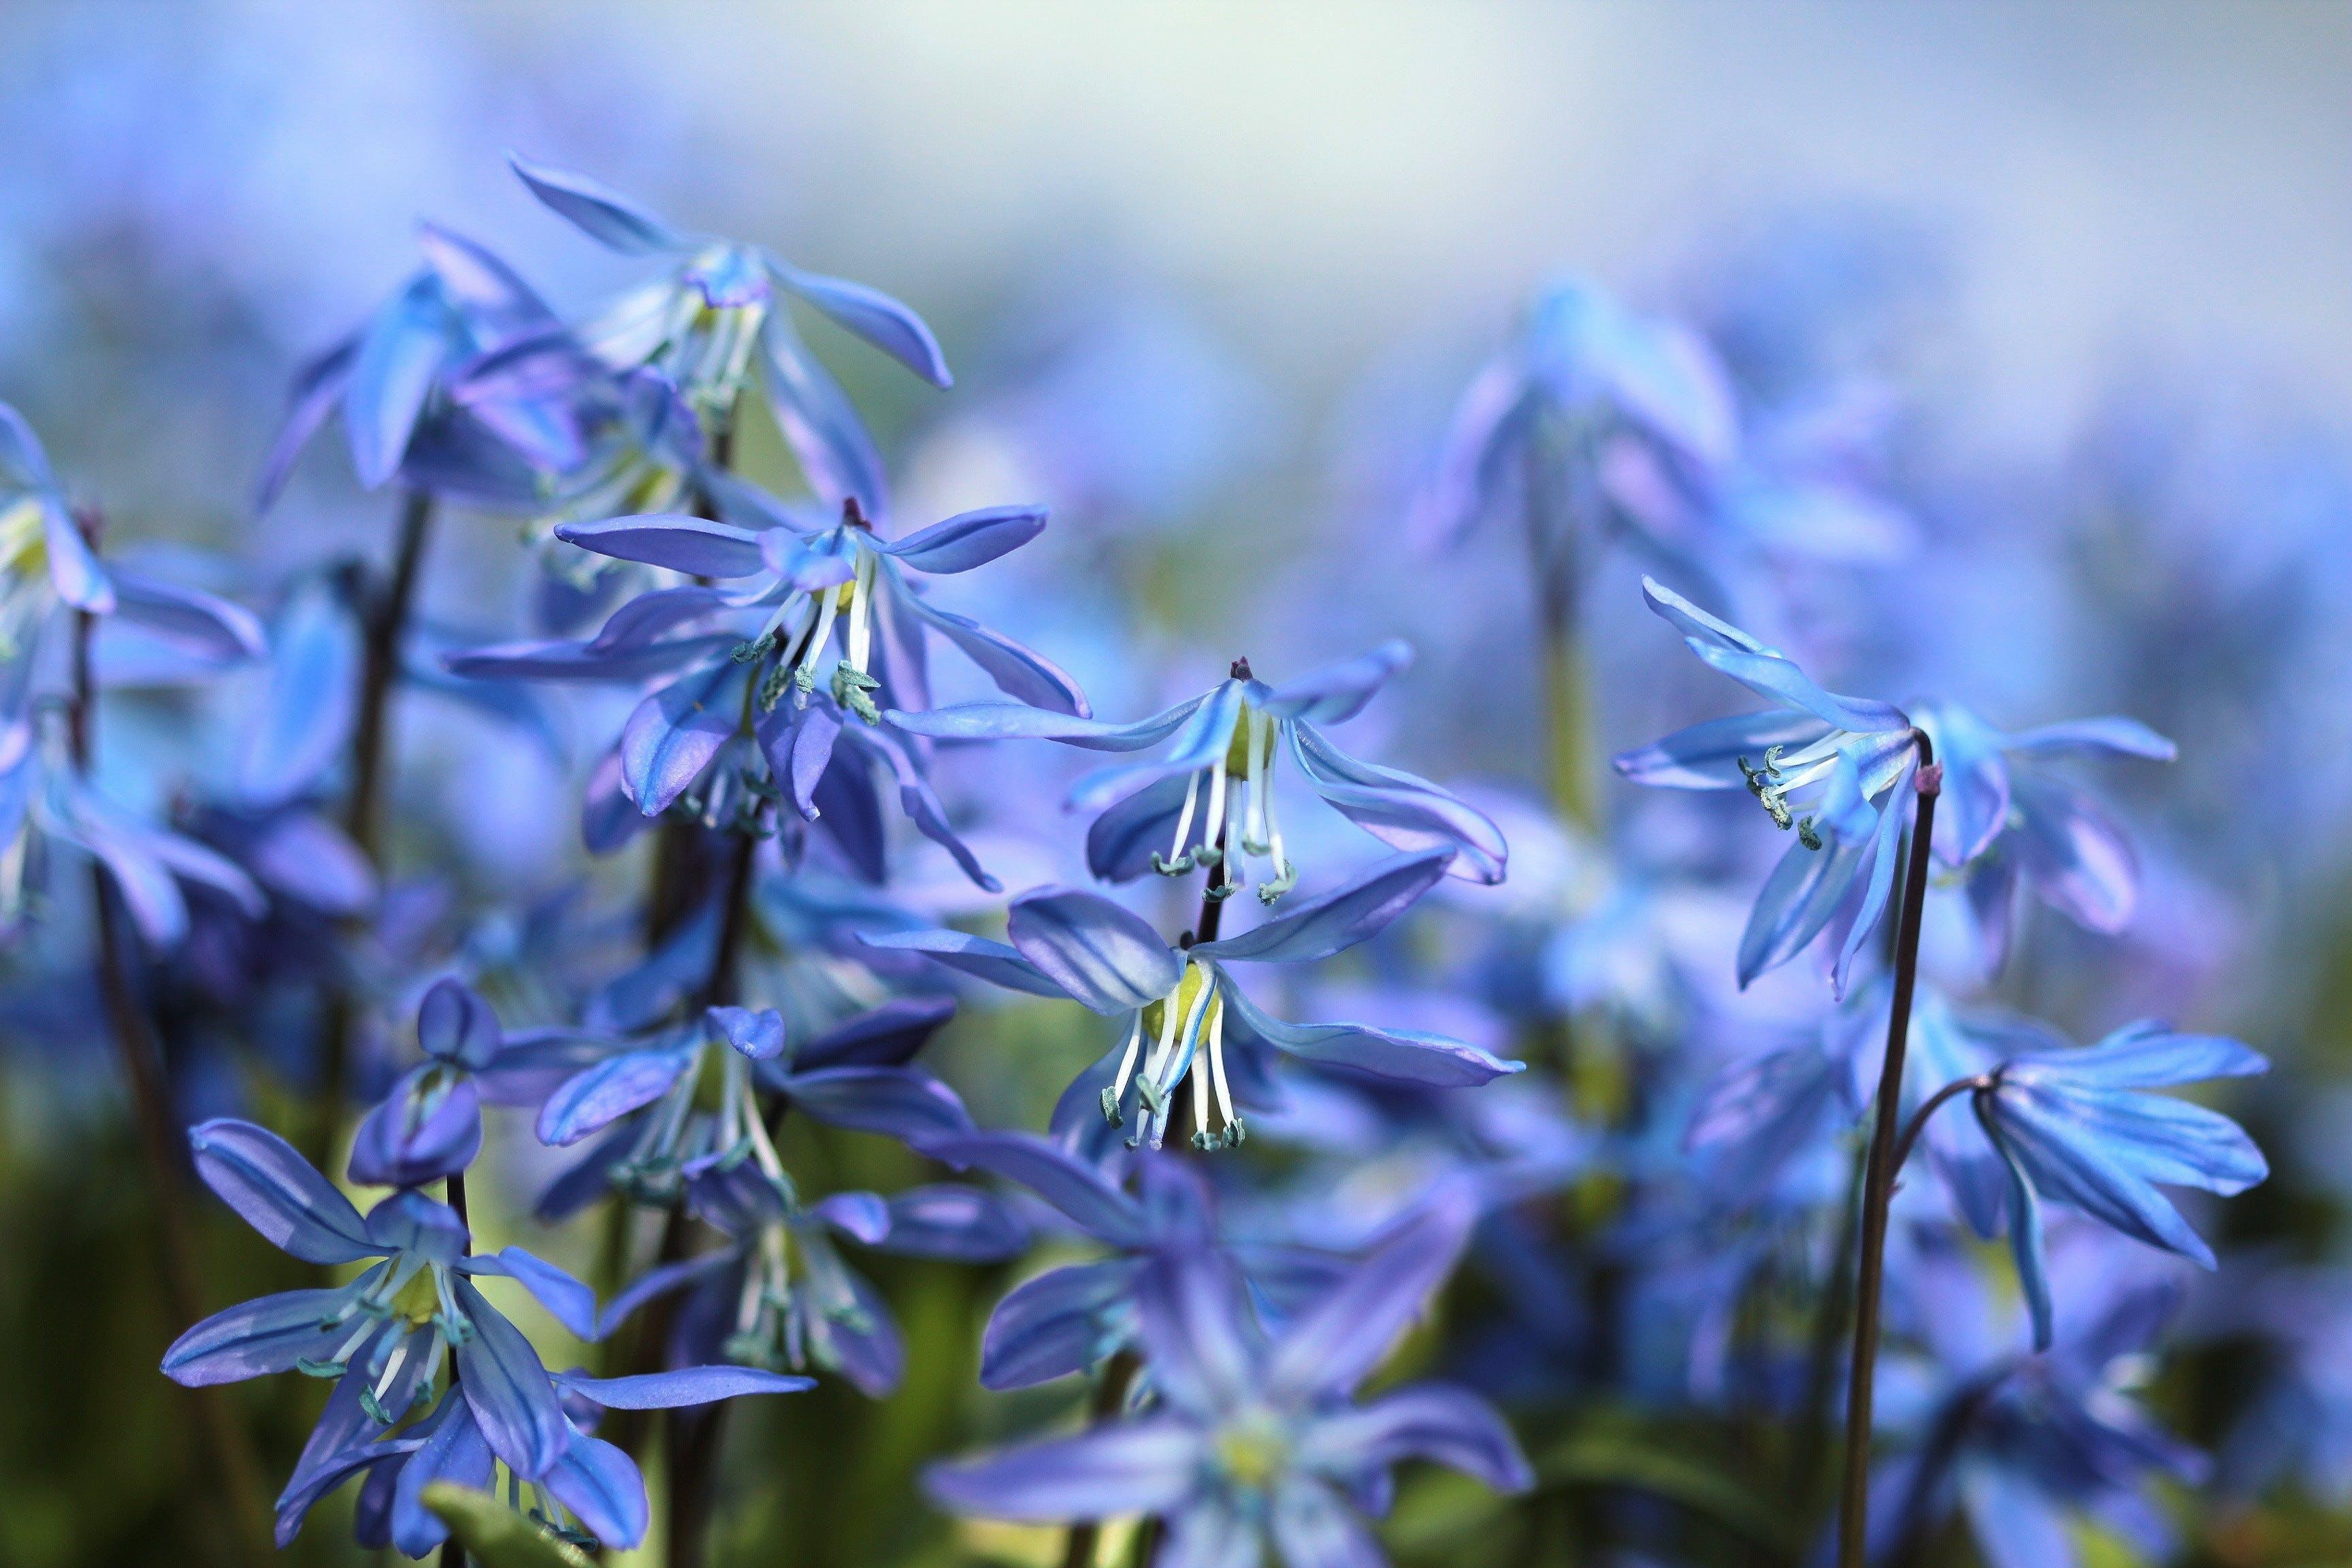 bloom, blurry, close-up